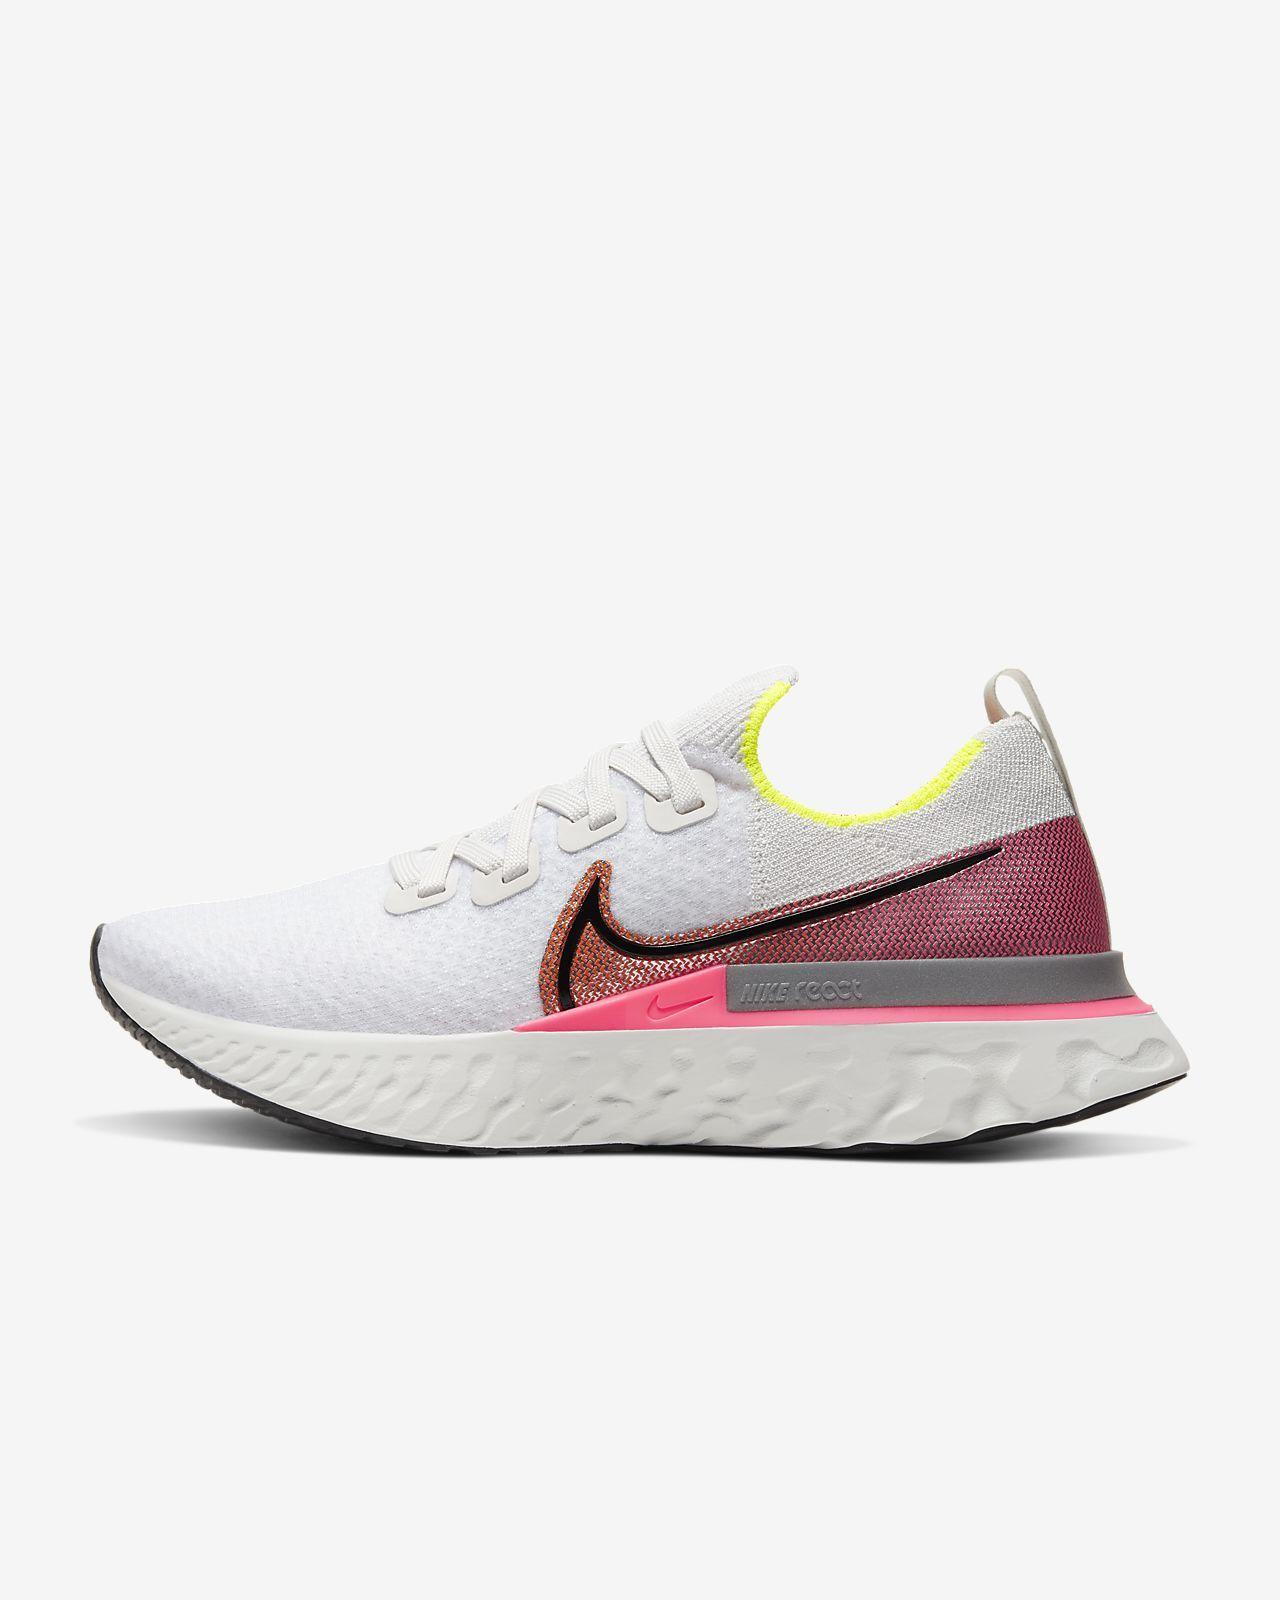 Nike React Infinity Run Flyknit női futócipő